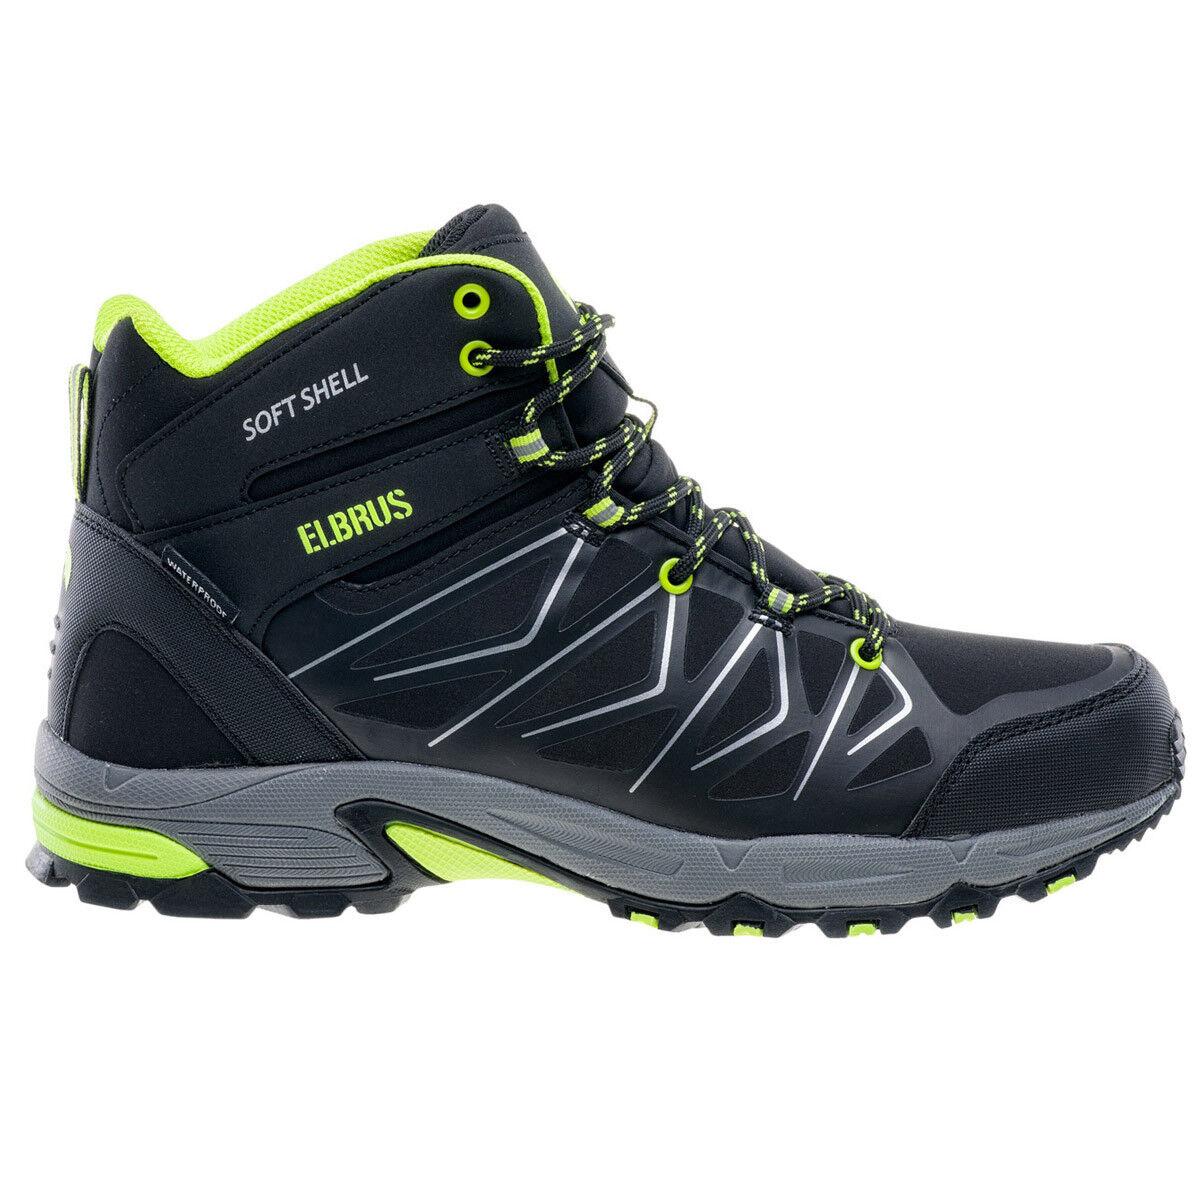 Elbrus Herren Gabby Mid WP Softshell Schuhe Herren Elbrus Wanderschuhe Trekking Outdoor NEU 9decfa